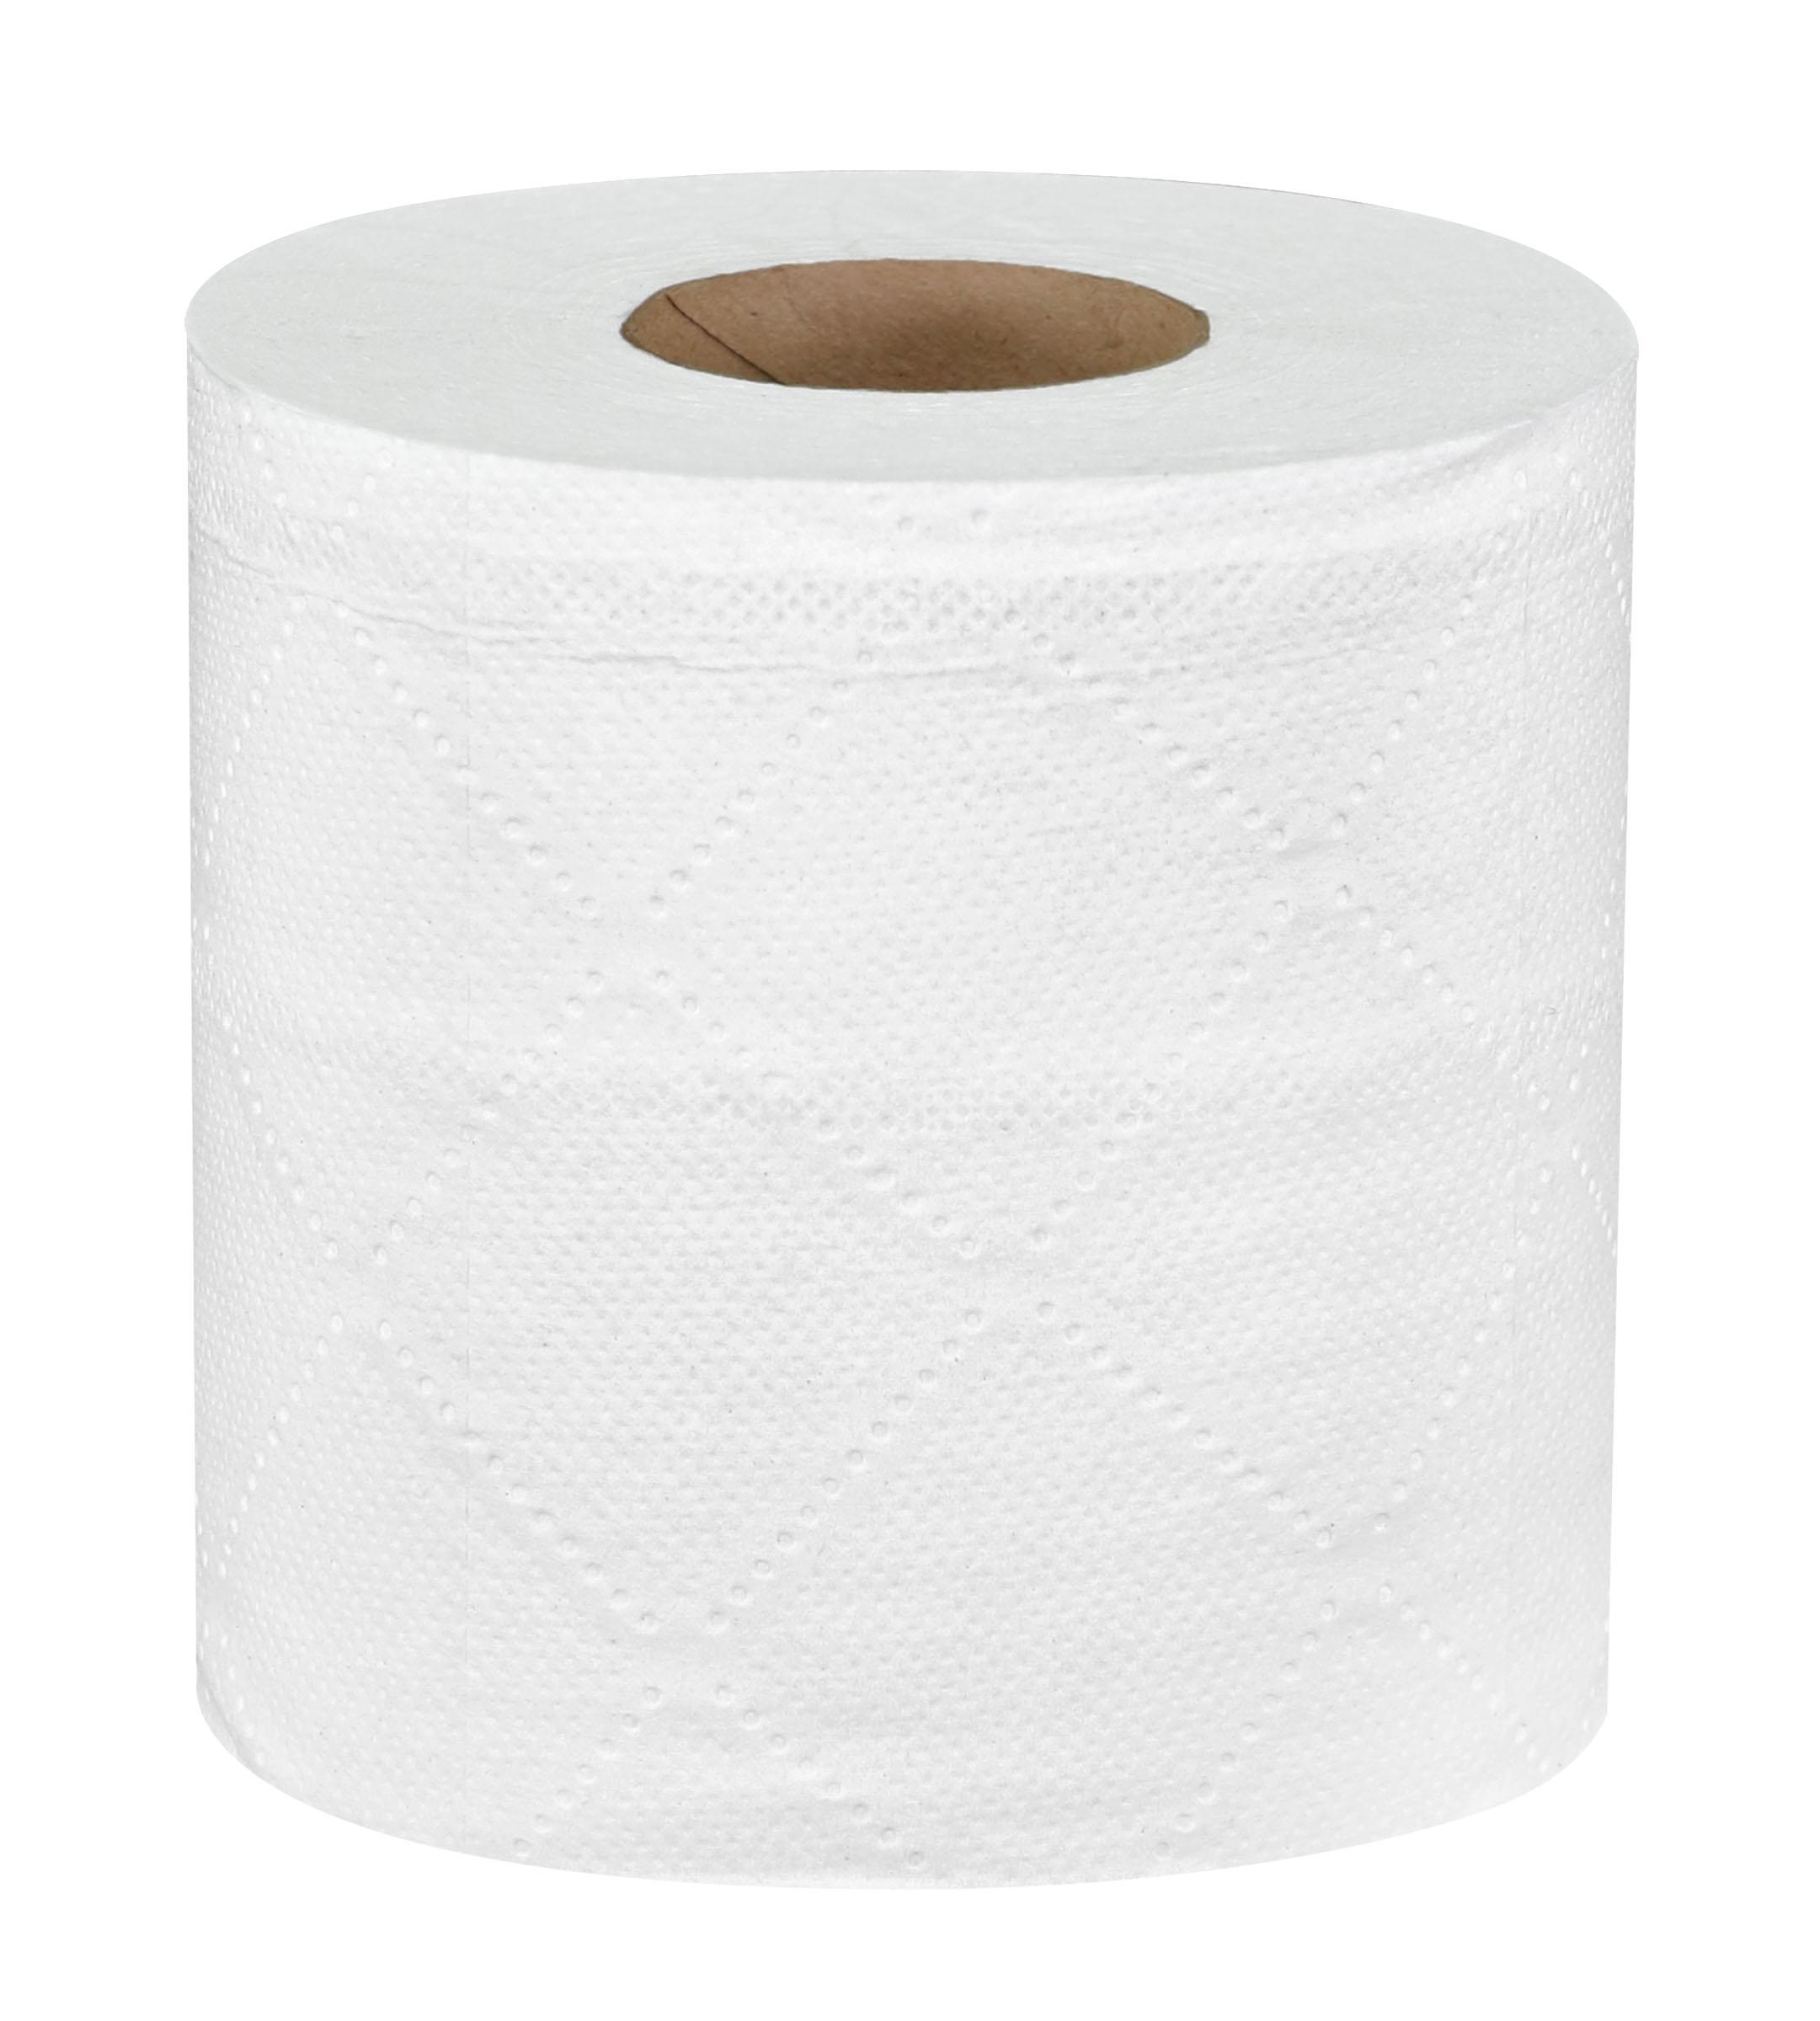 Roll of Sellars Mayfair® 550ct 2-ply bath tissue